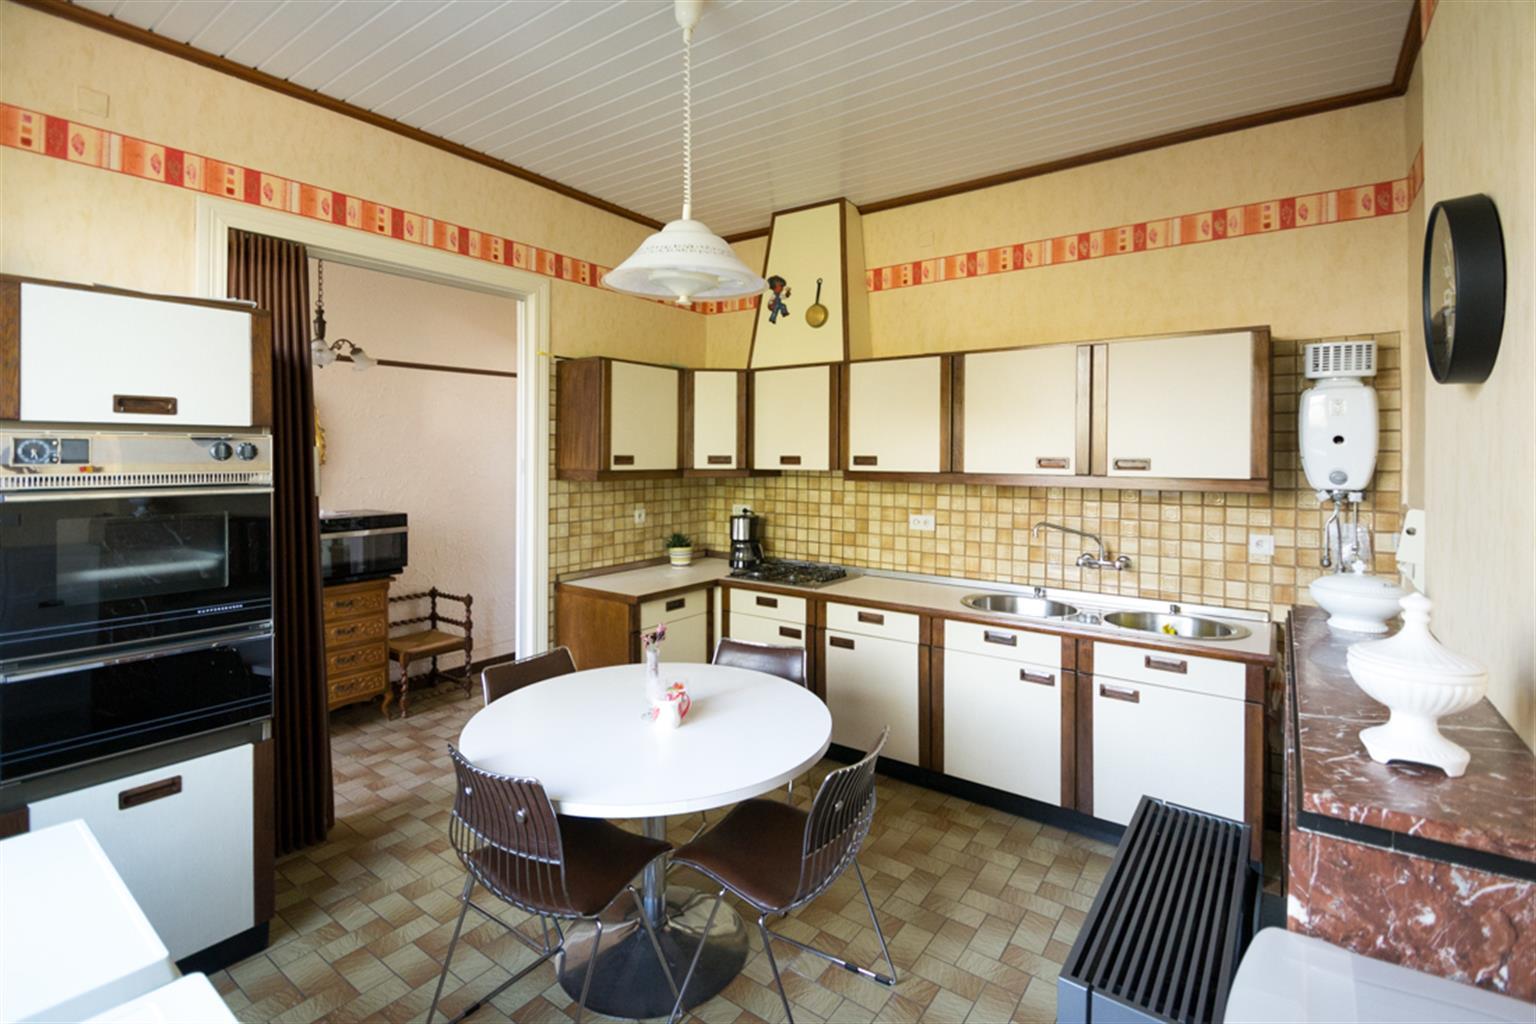 Maison - Leval-Trahegnies - #4345091-5